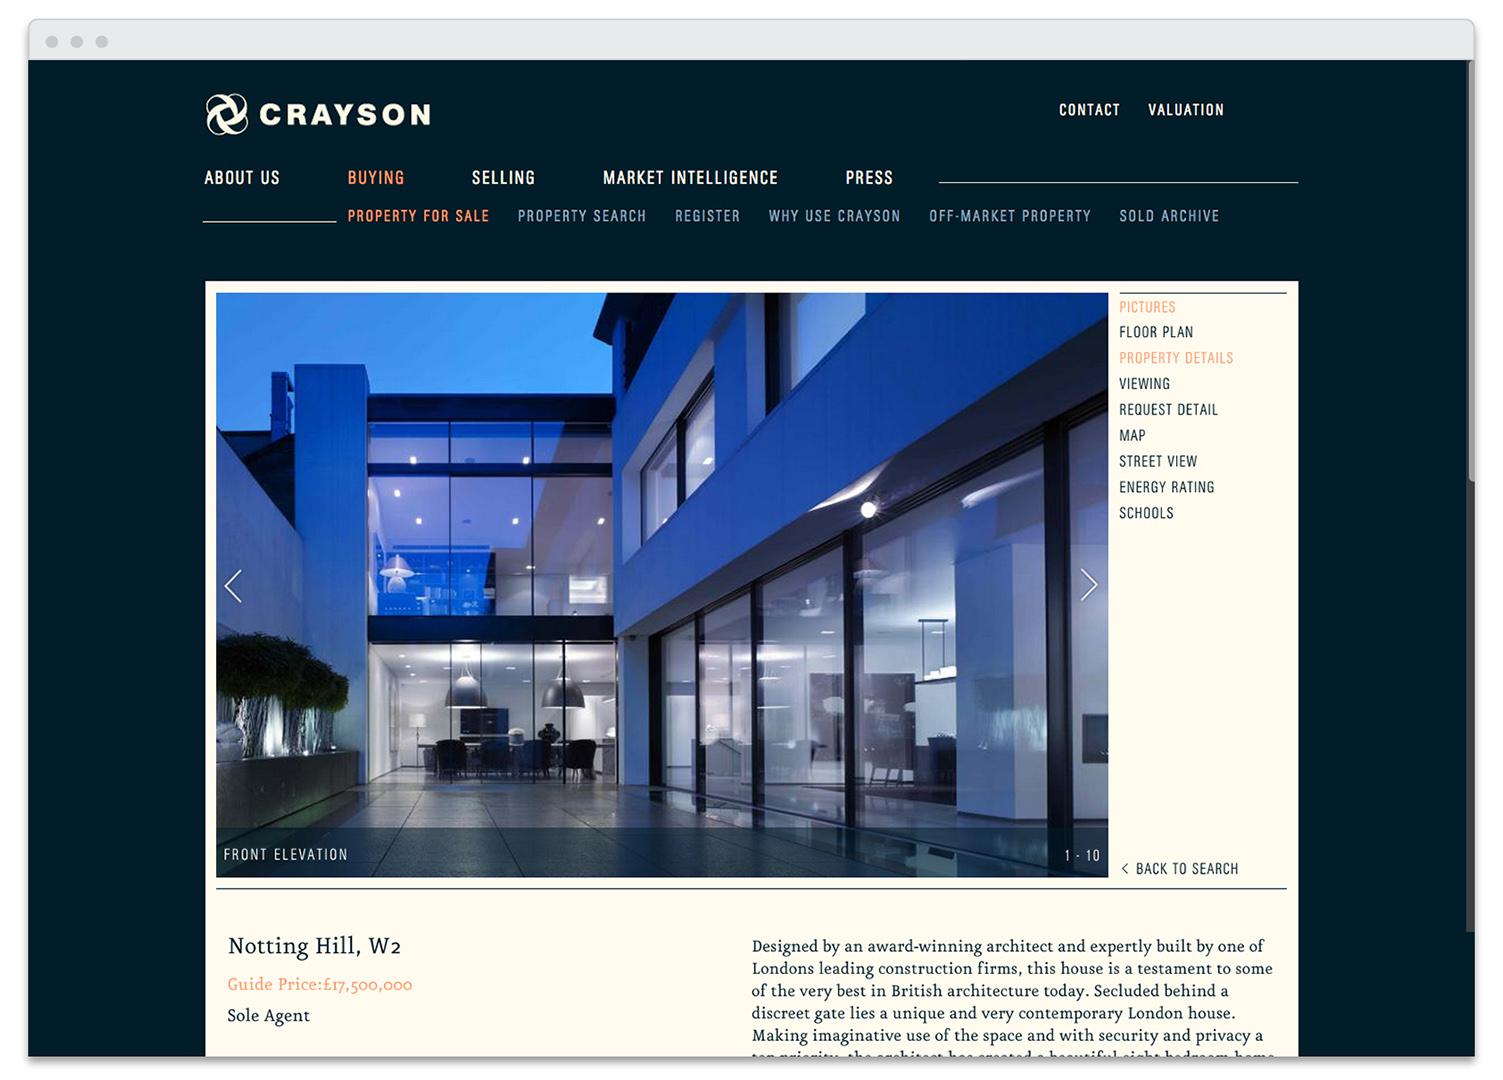 Crayson-Browser-view_propertysingle